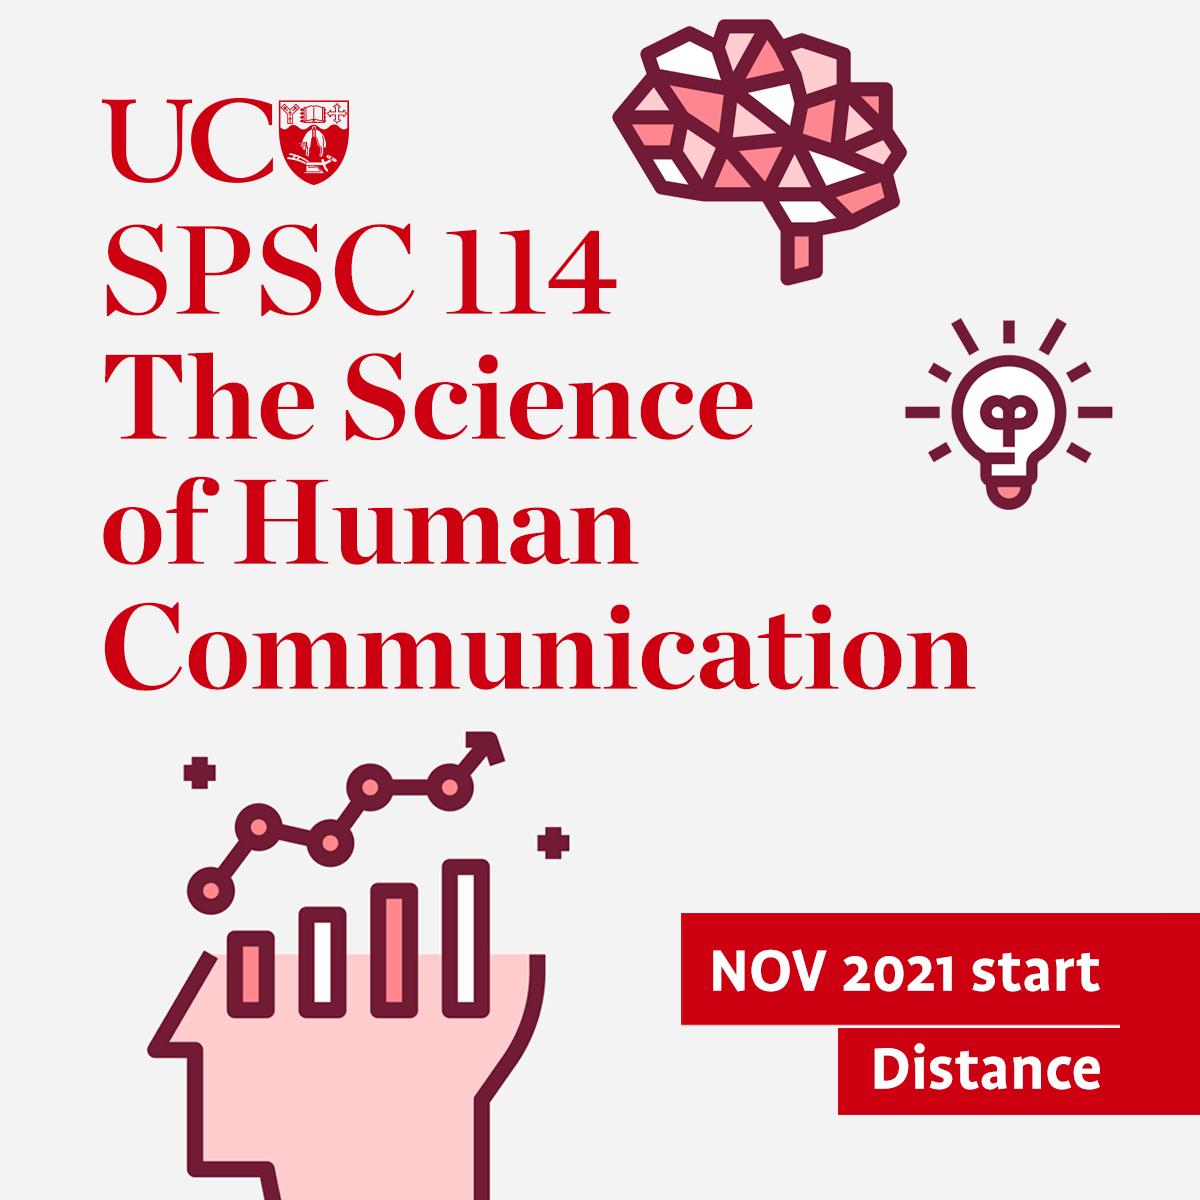 SPSC114